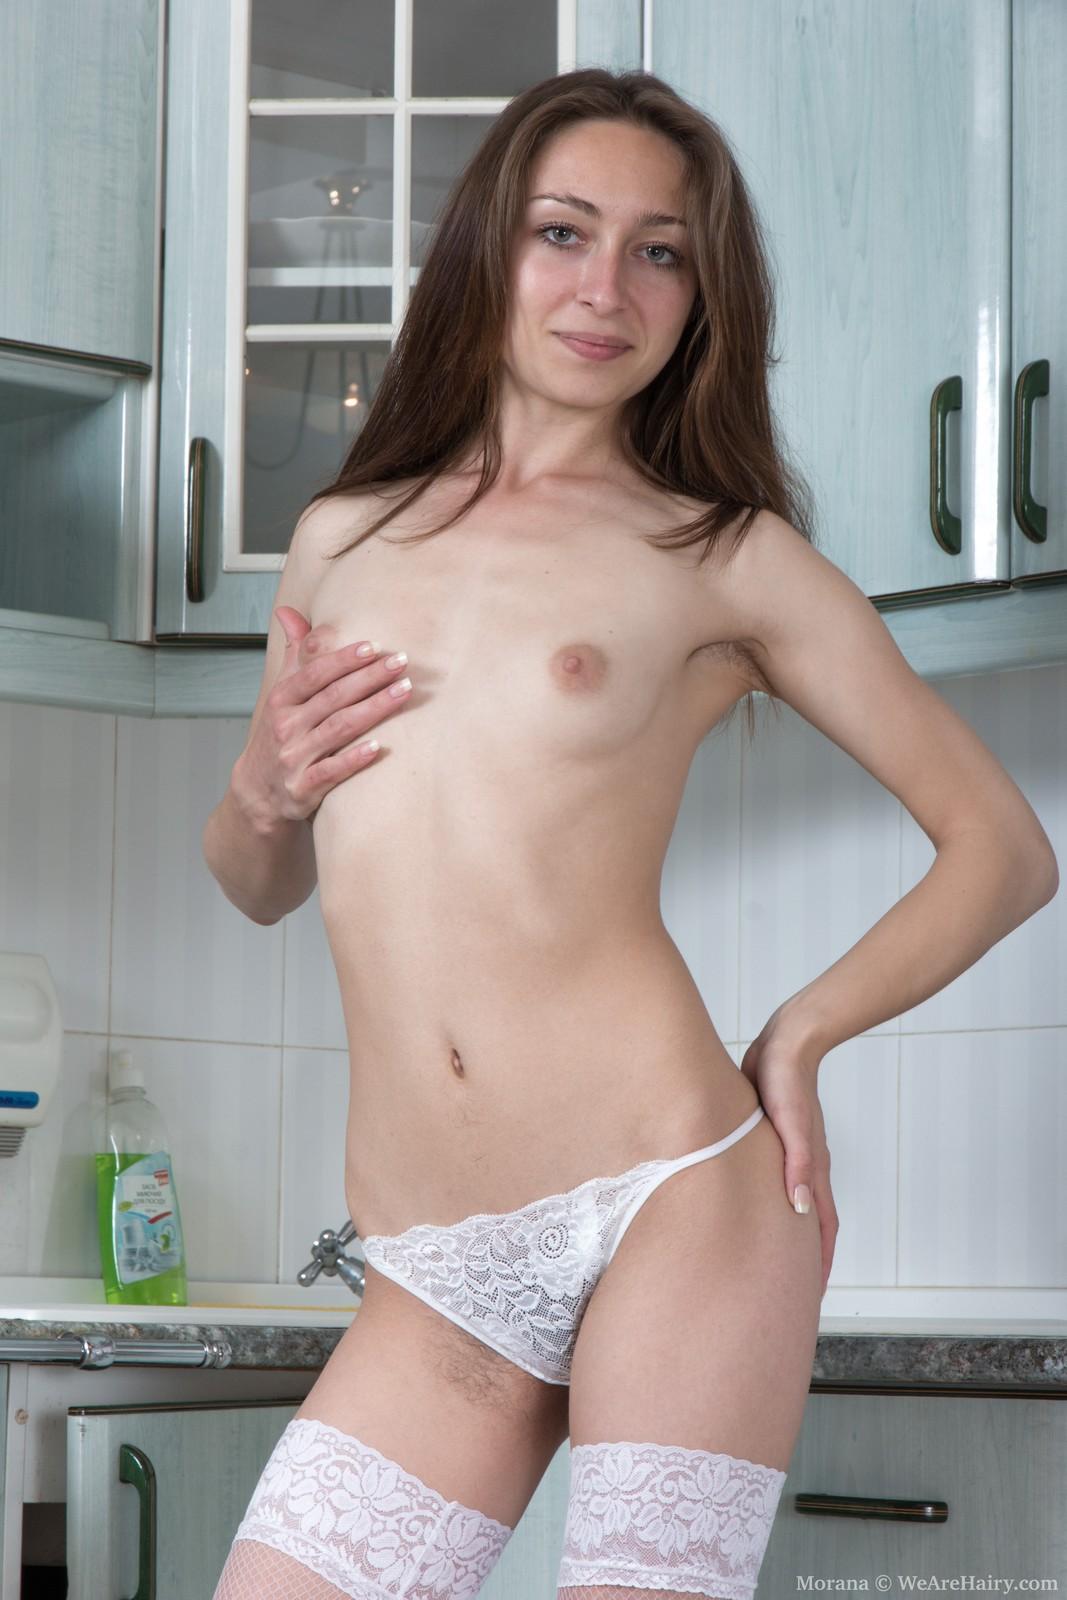 Hot women porn movies